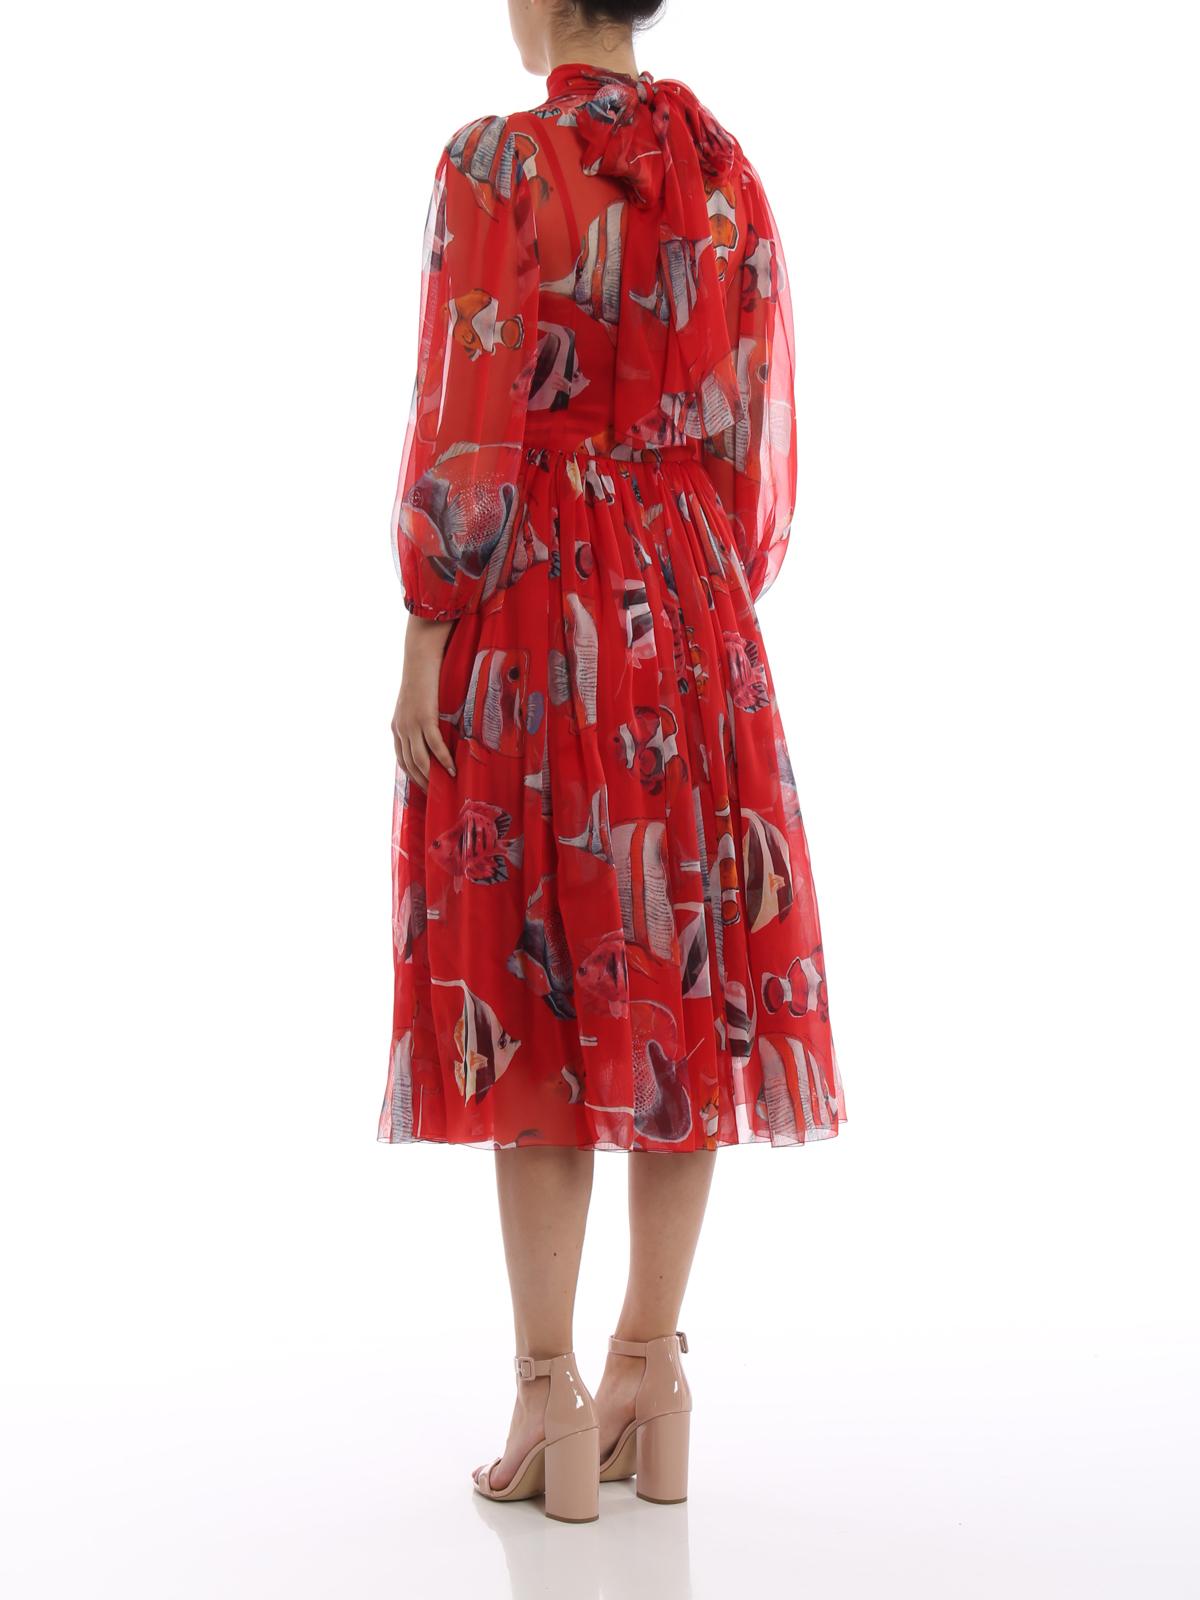 6c3a8a39 Dolce & Gabbana - Printed silk chiffon tie-neck dress - cocktail ...